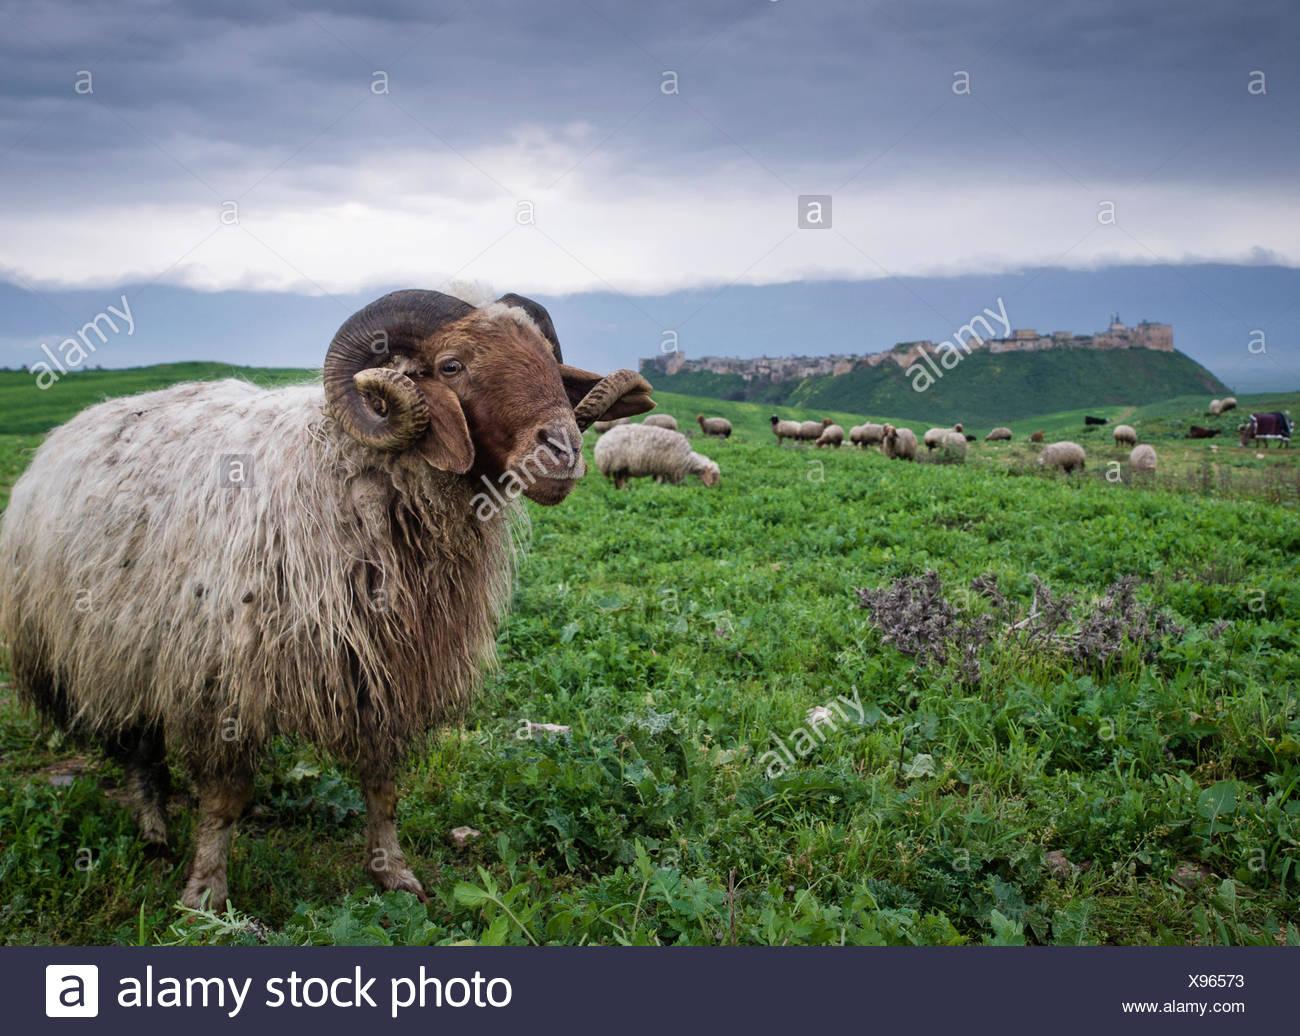 Flock of sheep, Qalaat al-Madiq, Hama, Syria - Stock Image